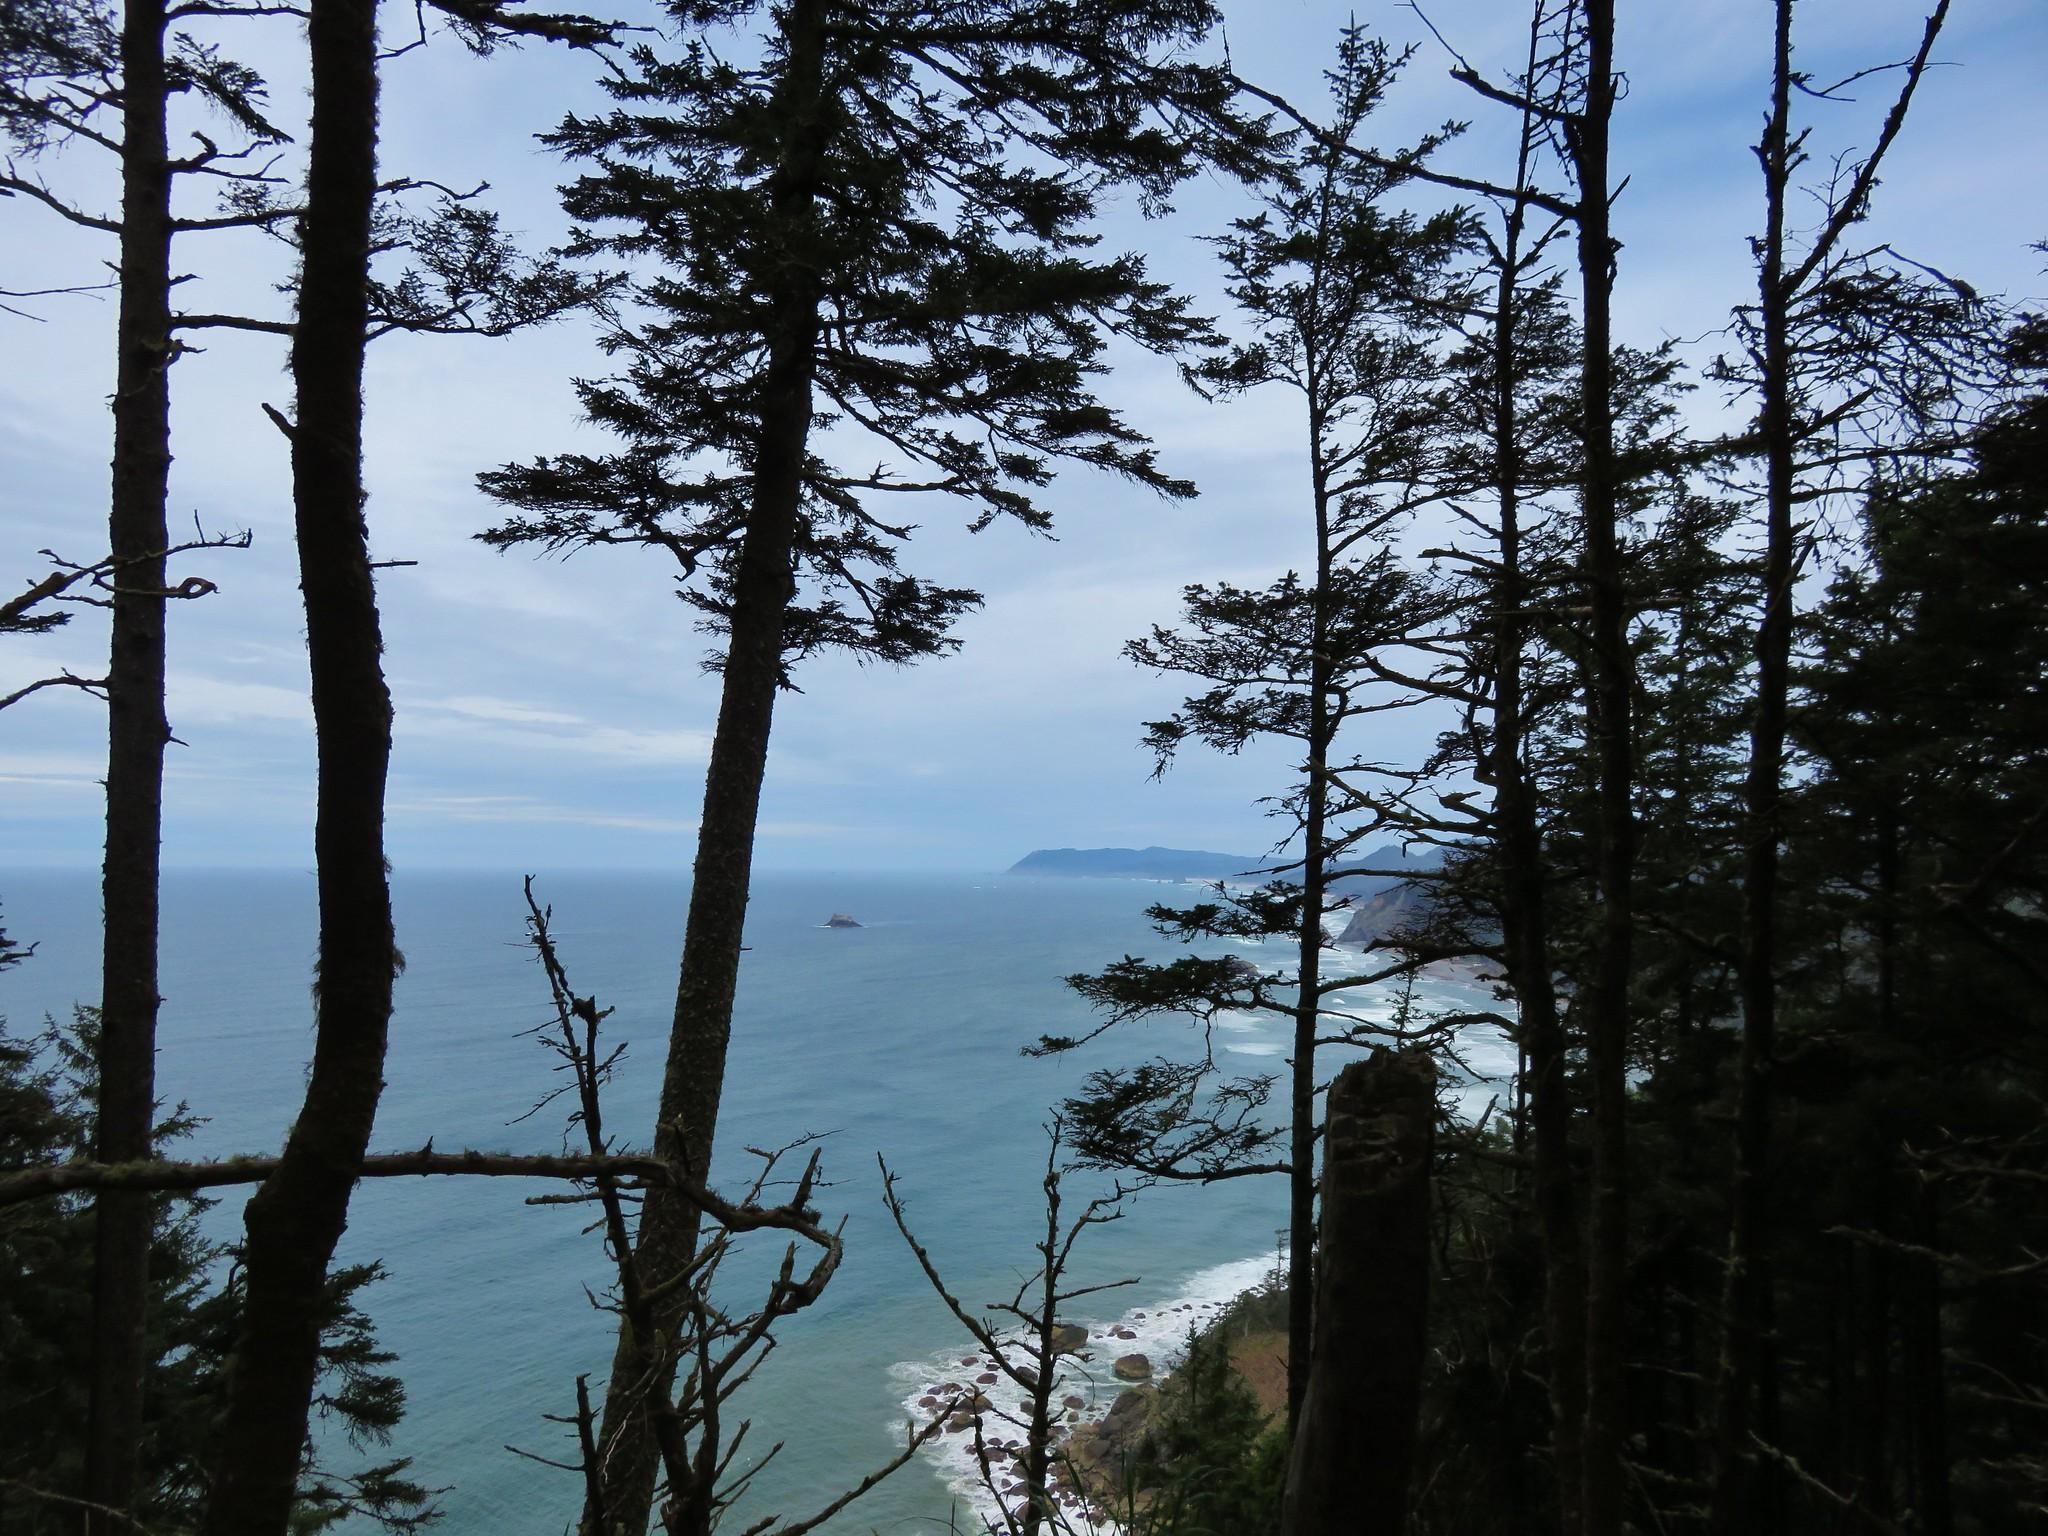 Tillamook Head from the Oregon Coast Trail